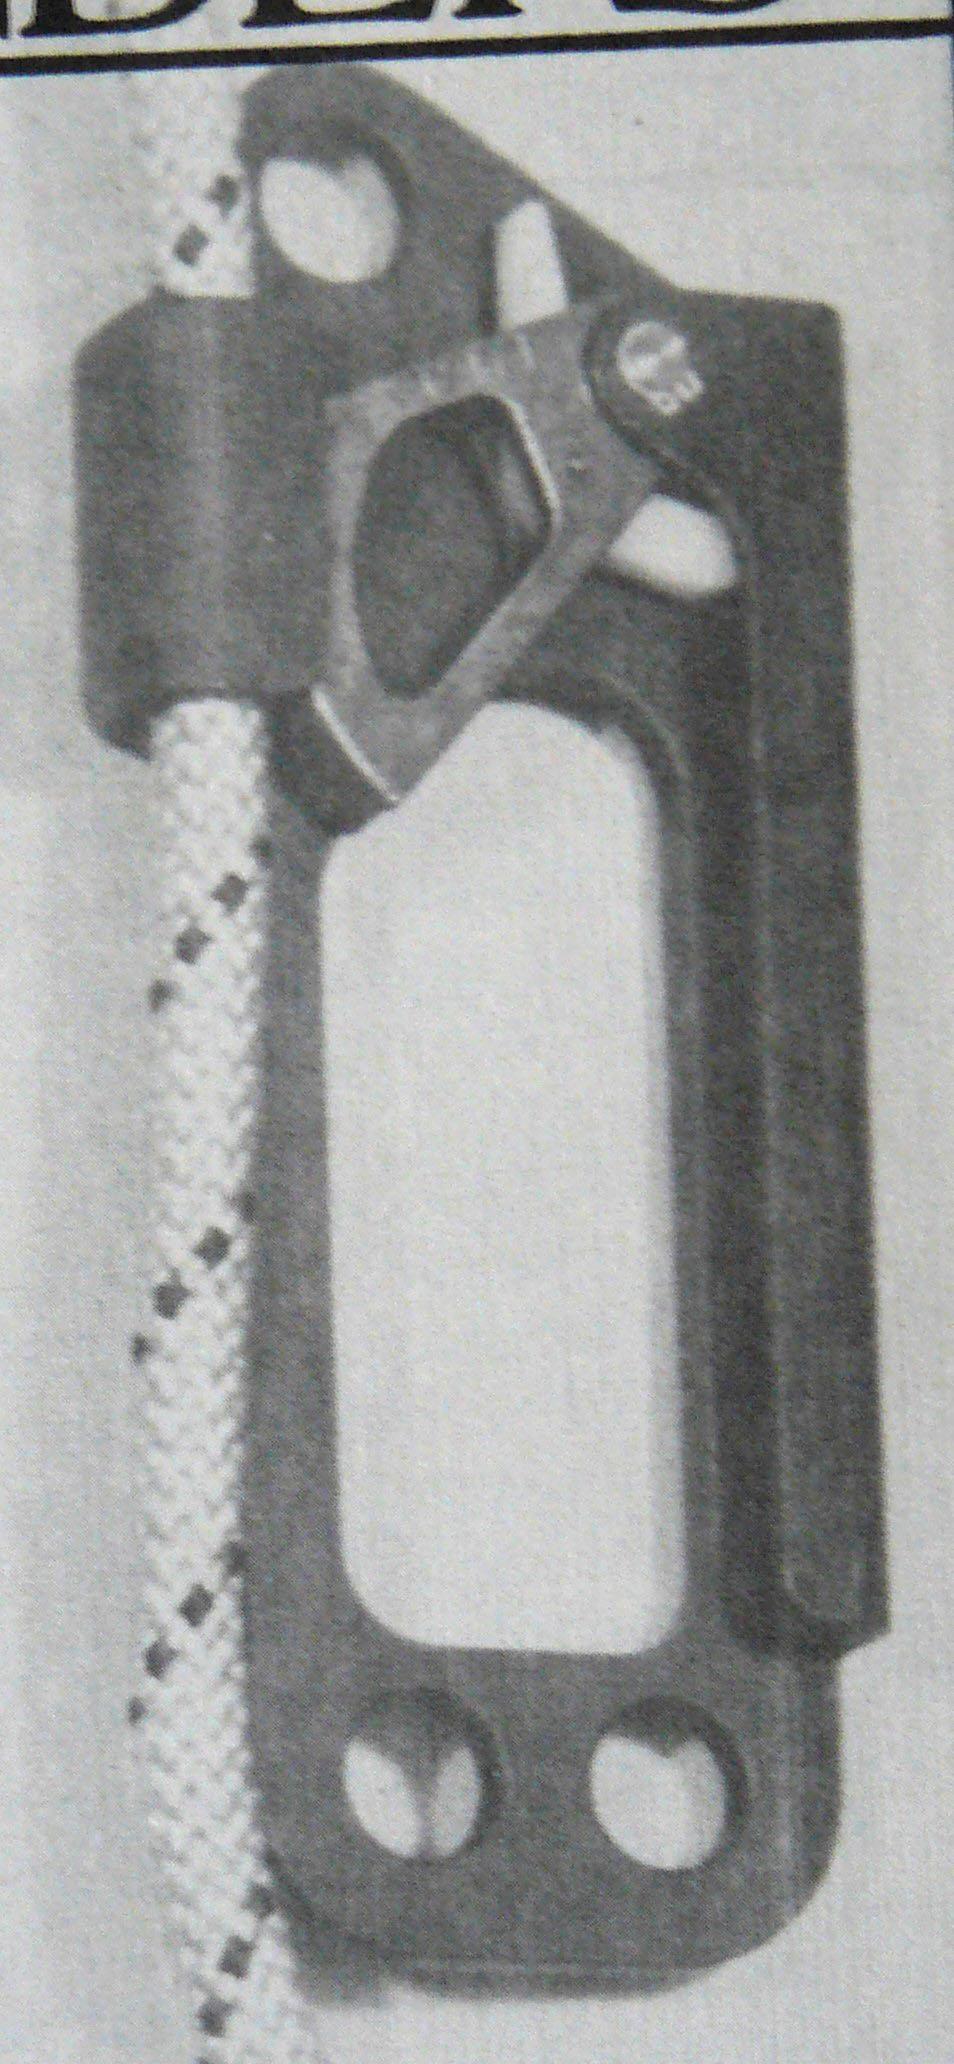 Šplhadlo CMI, cca 1982